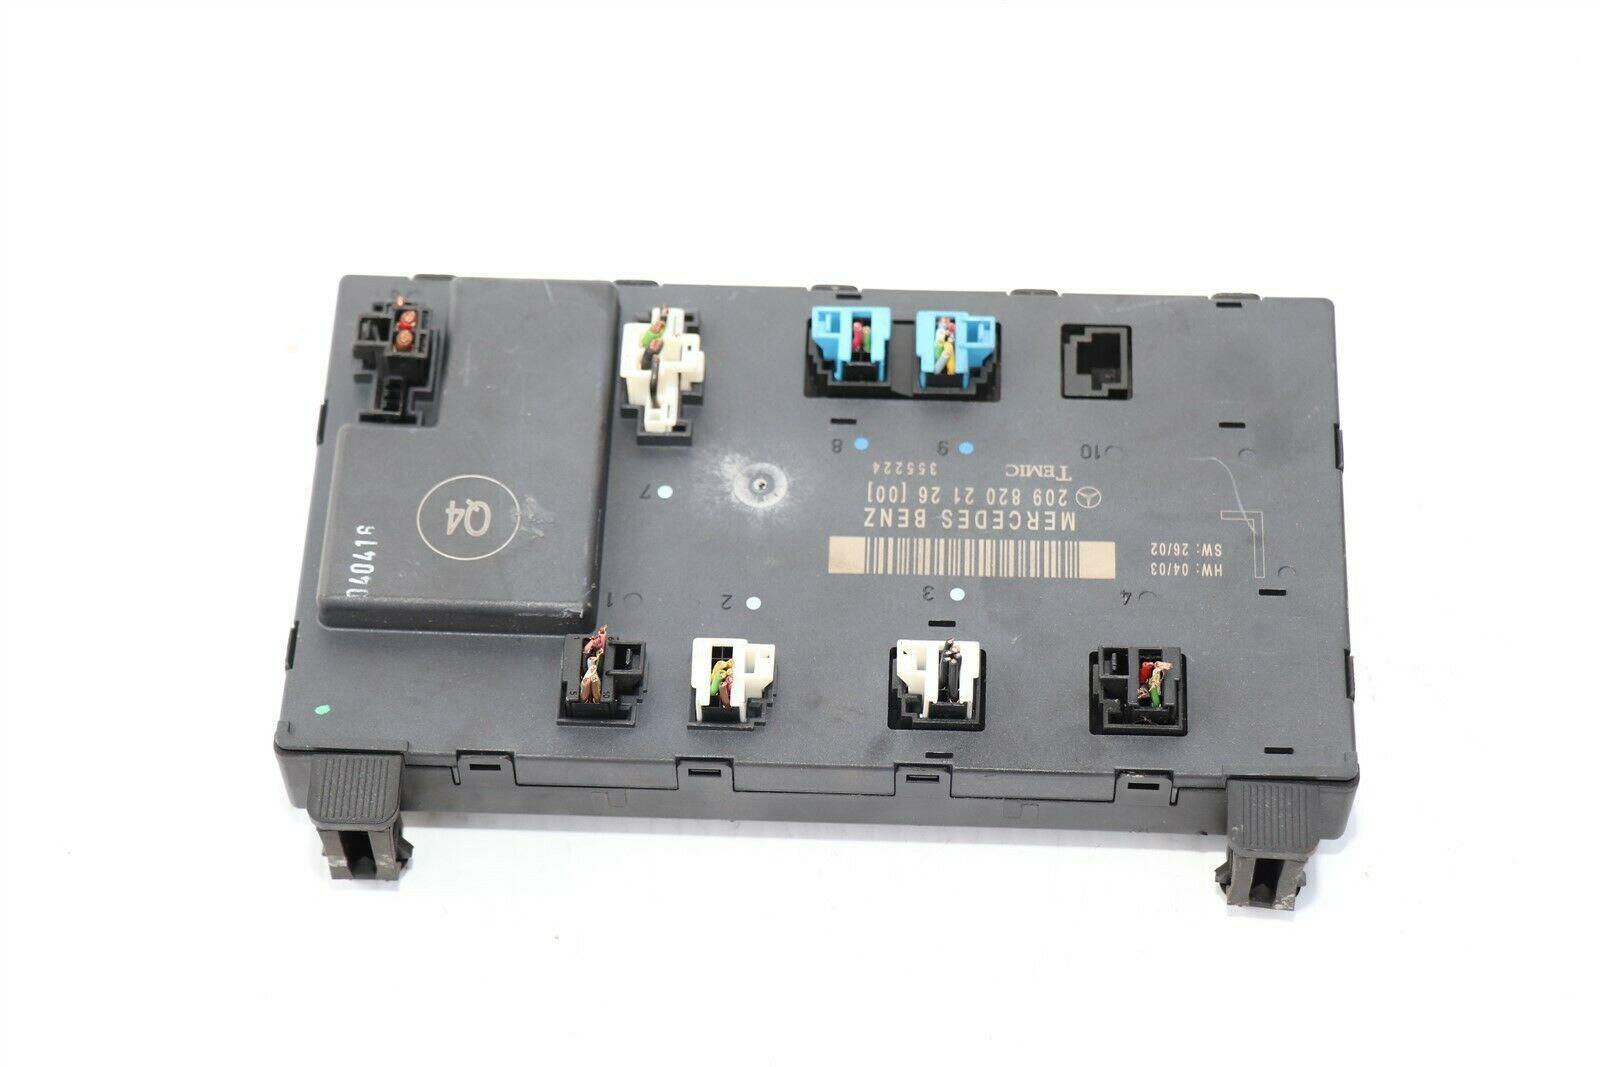 W209 Mercedes Clk320 Clk550 Clk55 Convertible Driver Left Door Control Module